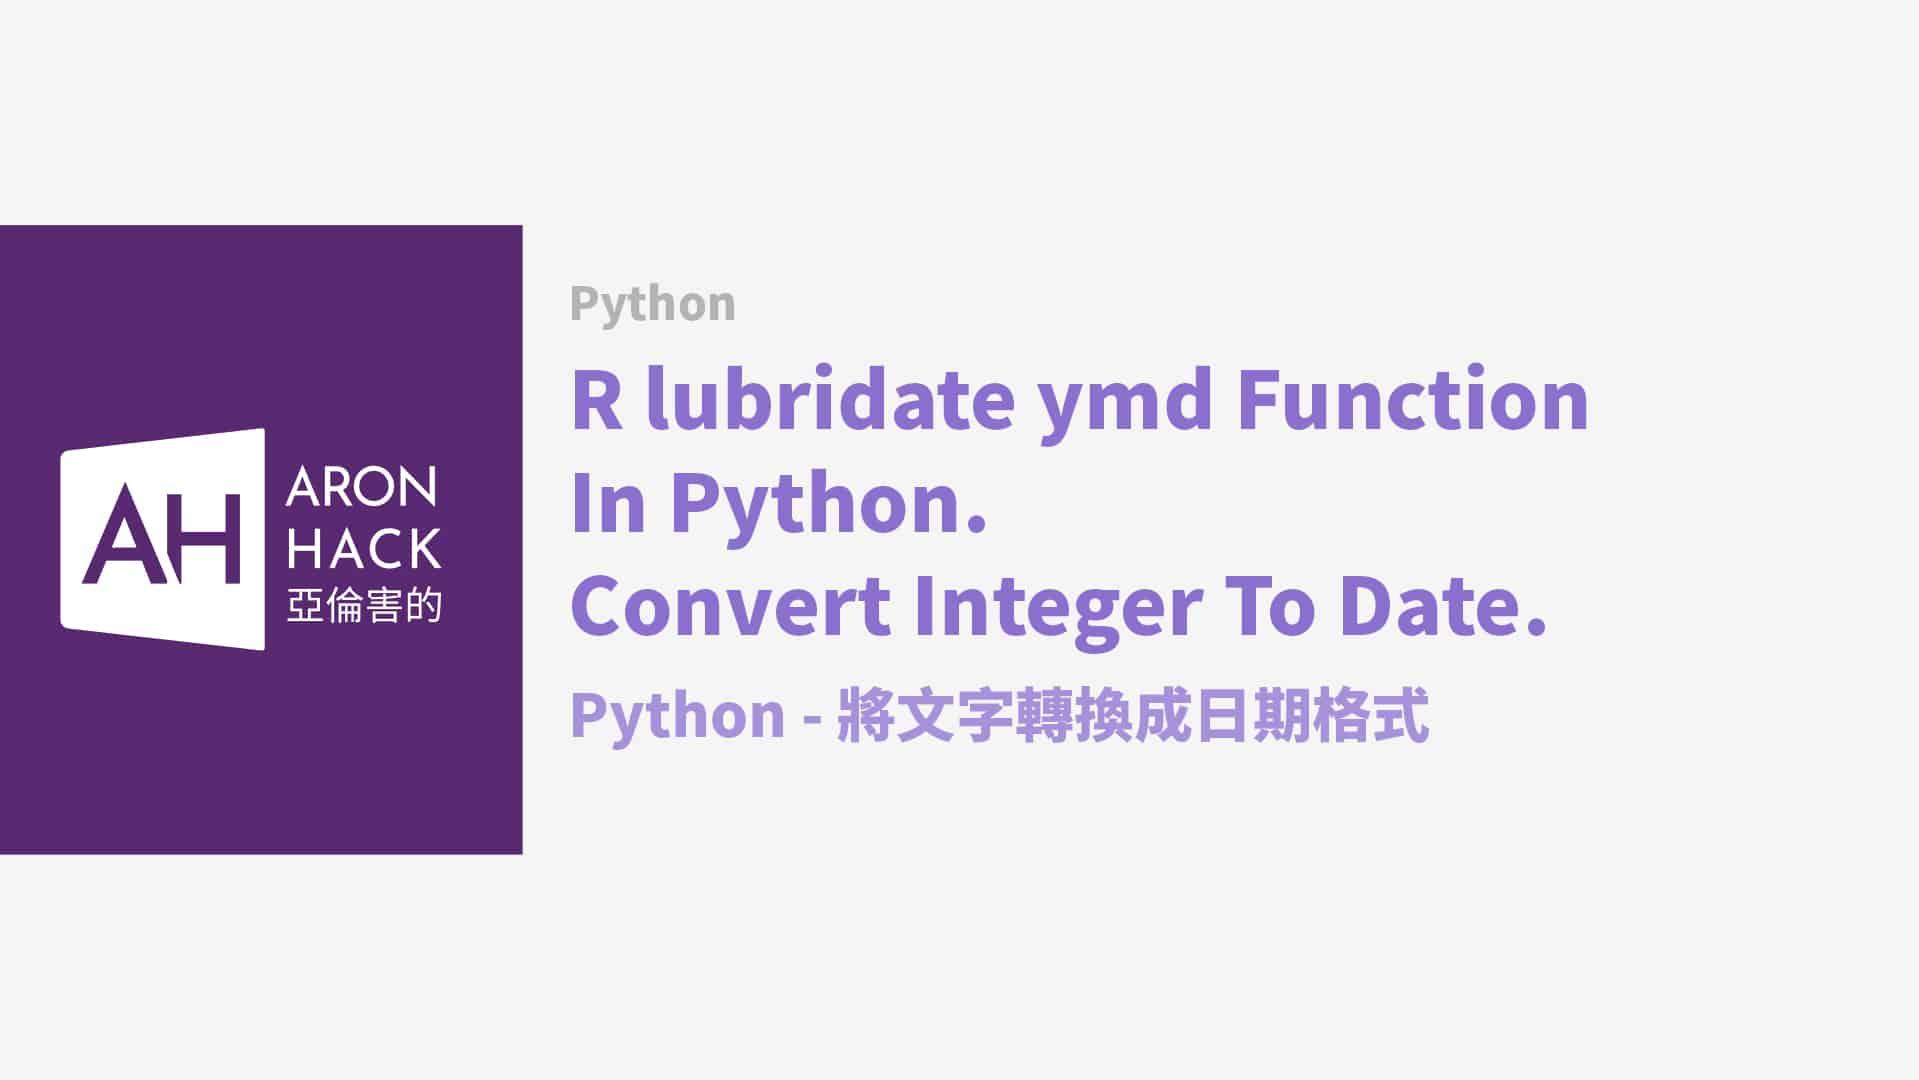 R-lubridate-ymd-Function-In-Python.-Convert-Integer-To-Date.jpg